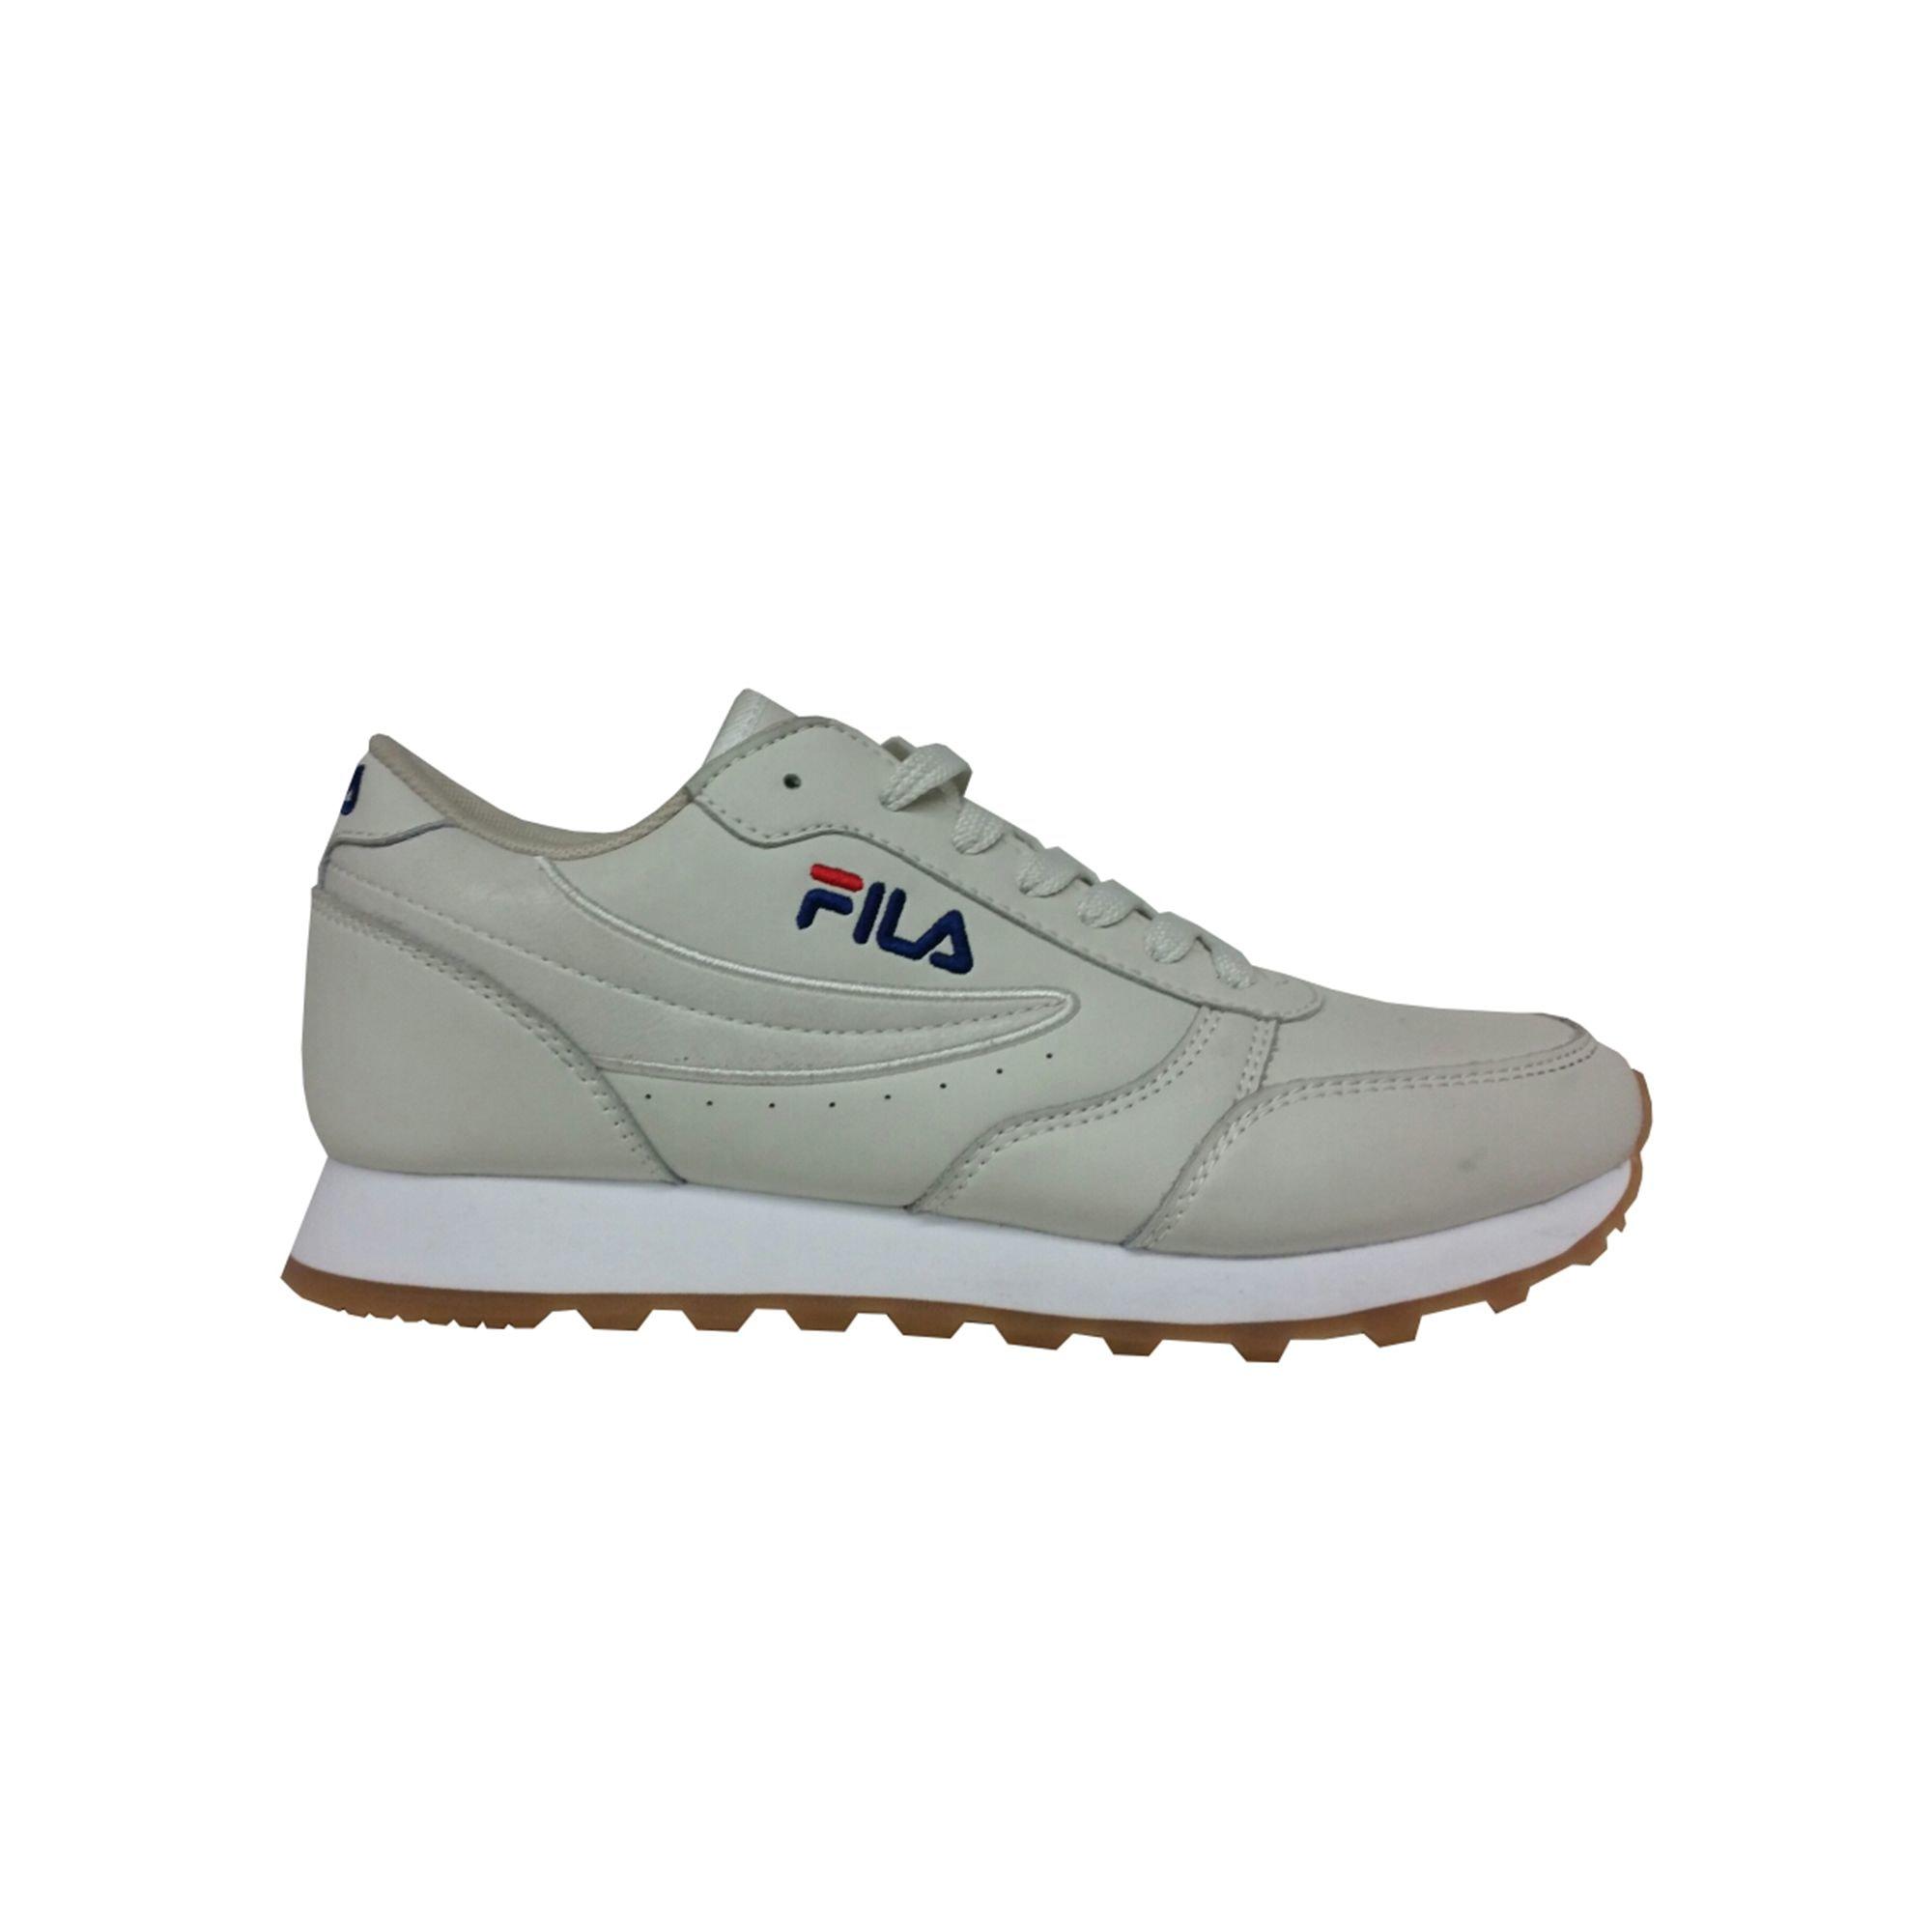 Fila 8721325 Sport Beige De 37 Chaussures qSUzjLVGMp